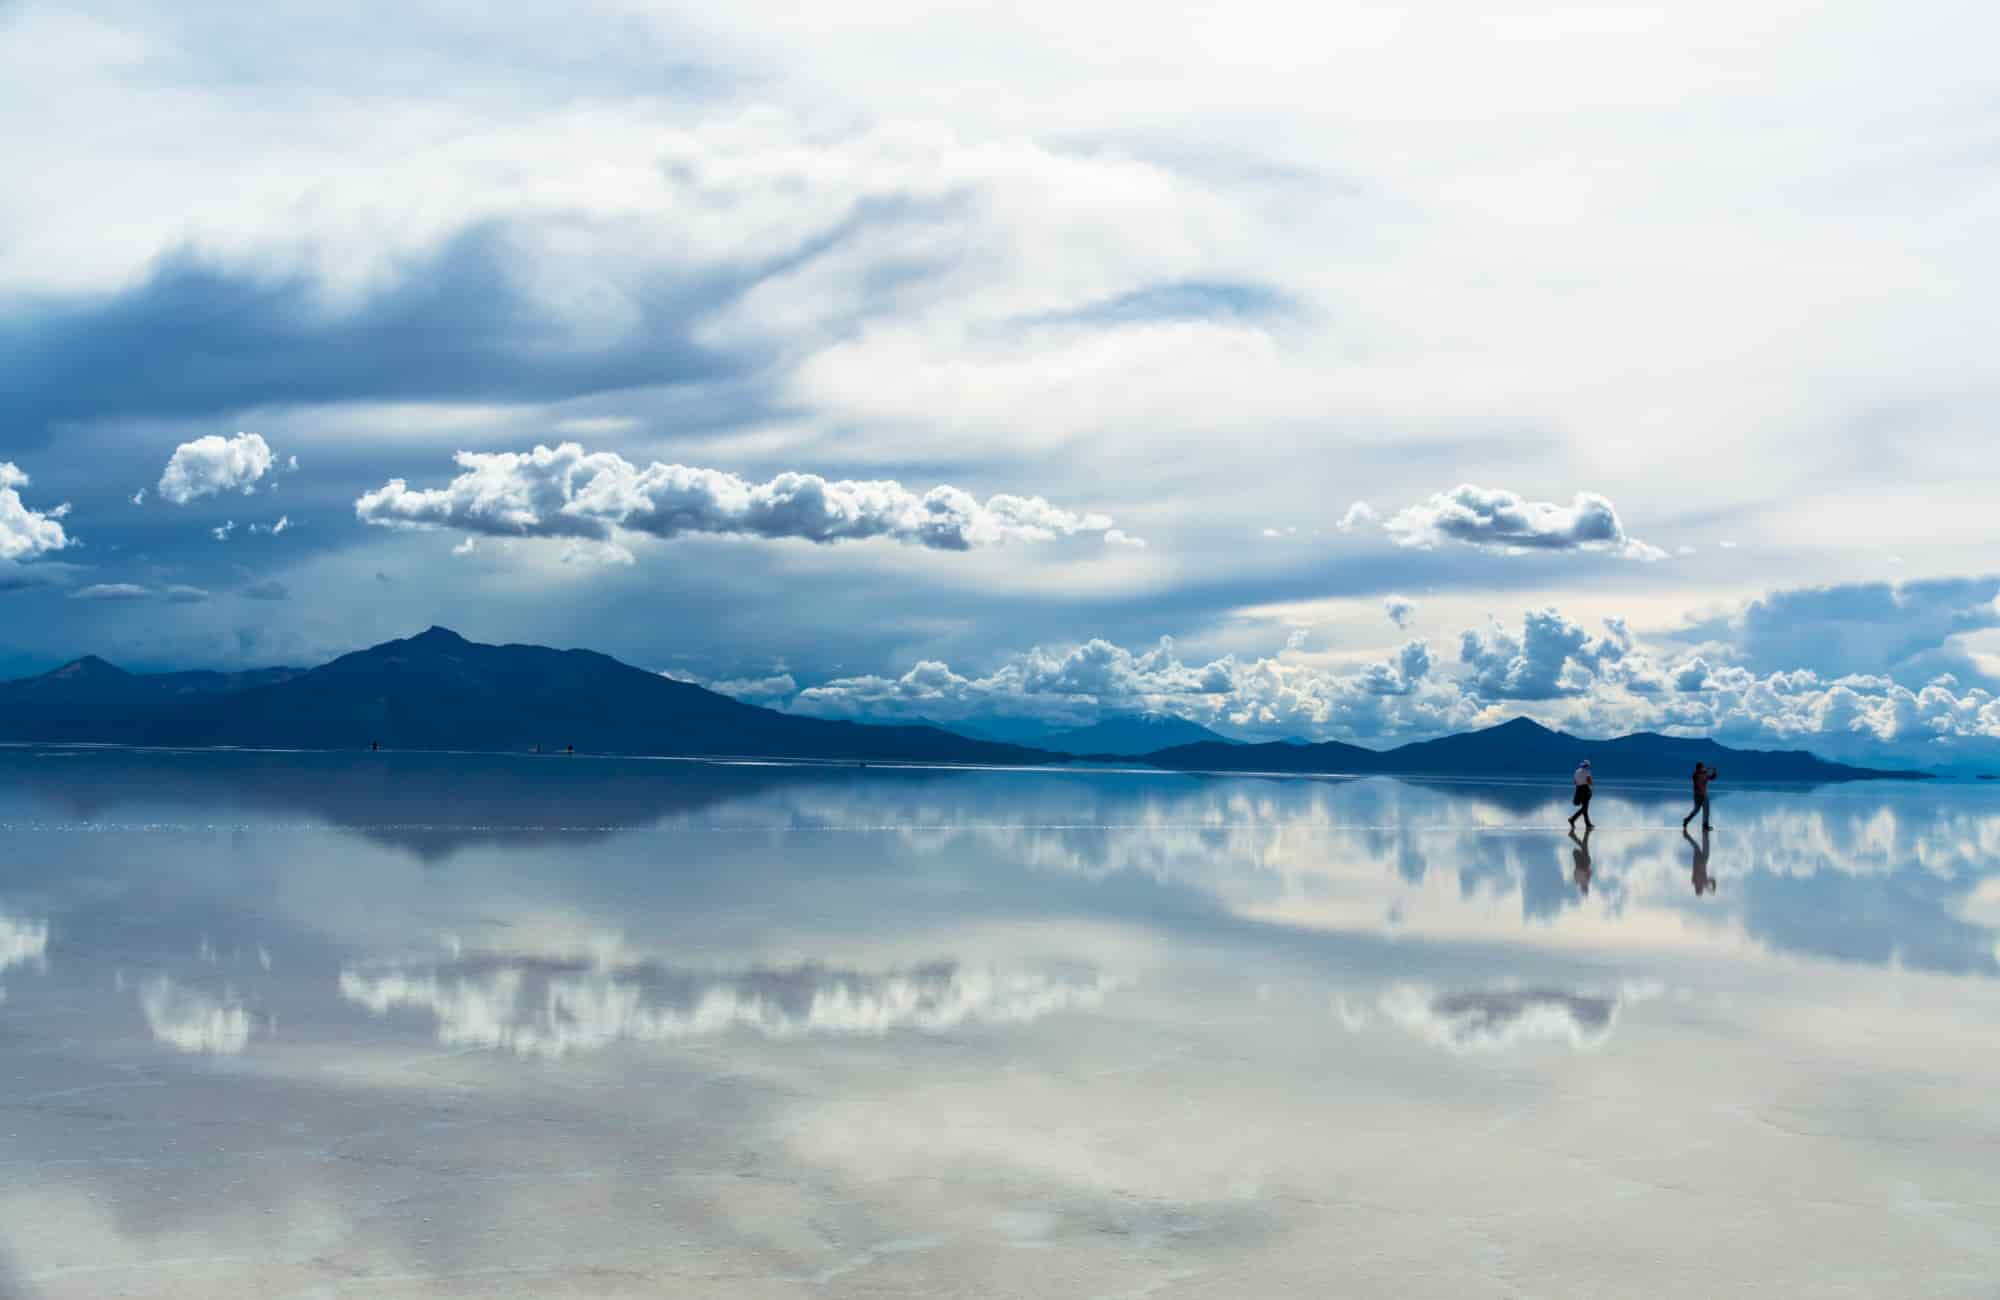 Salar de Uyuni Bolivie - Recoup